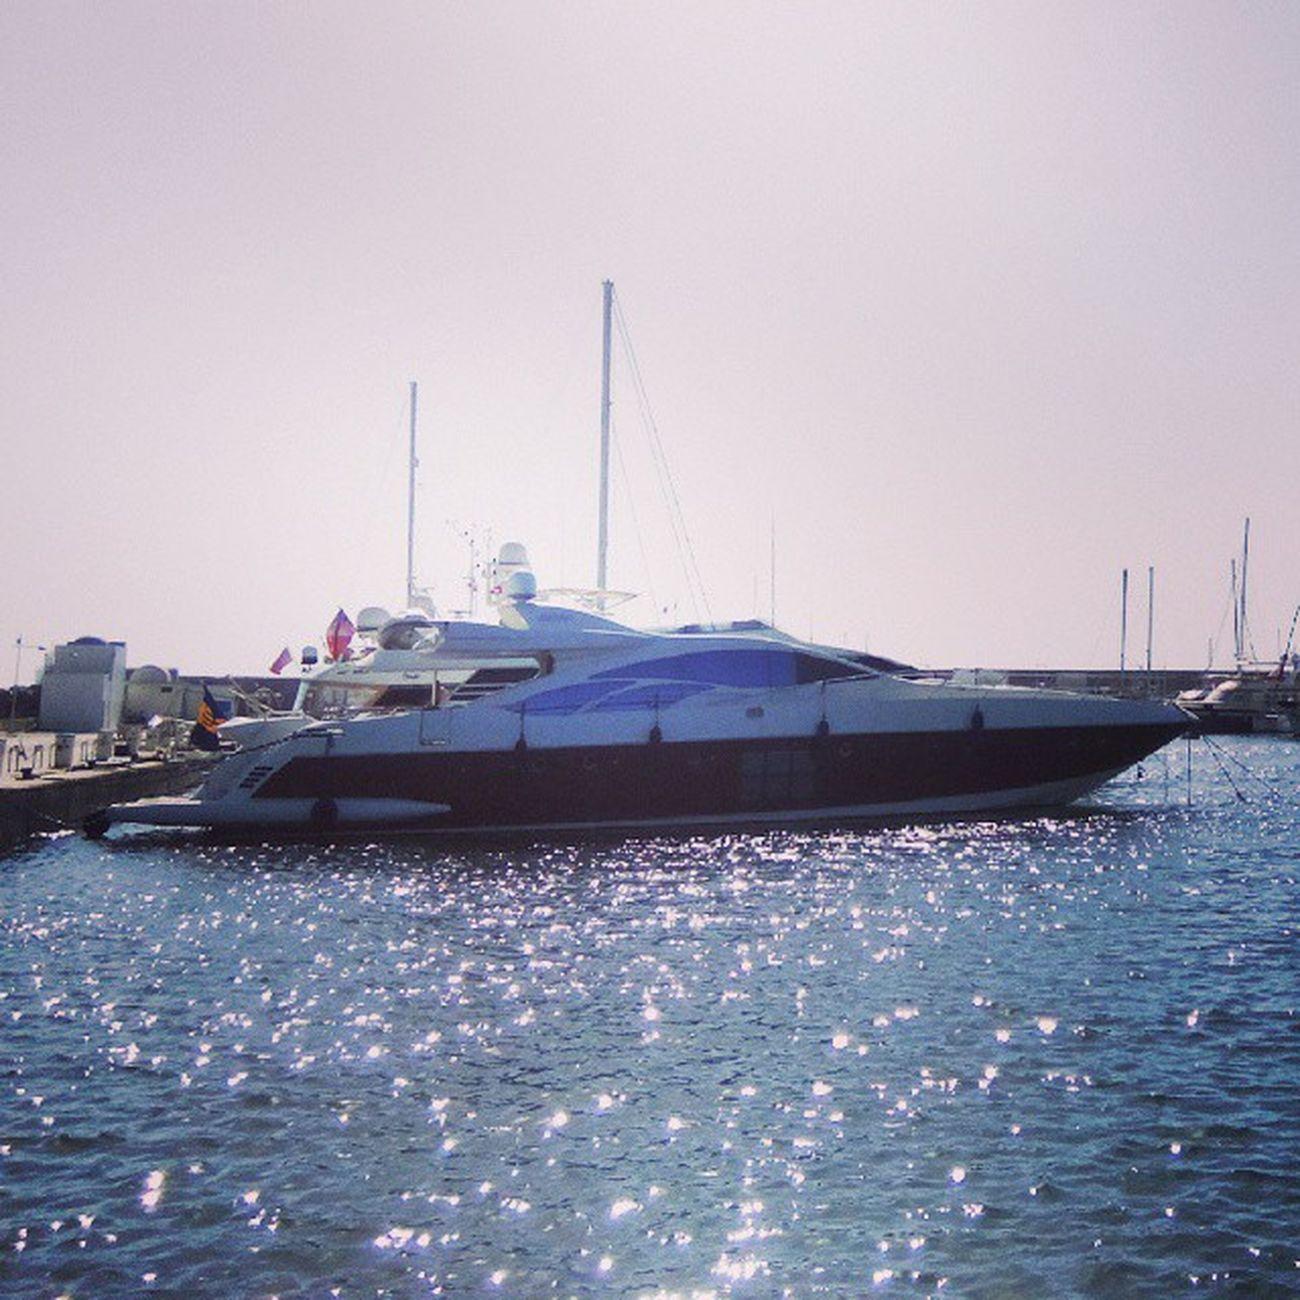 Vacation Tunesia Tunisia Hammamet happy seaside sea blue africa boat vscolove vscocam vsco vscophile yacht